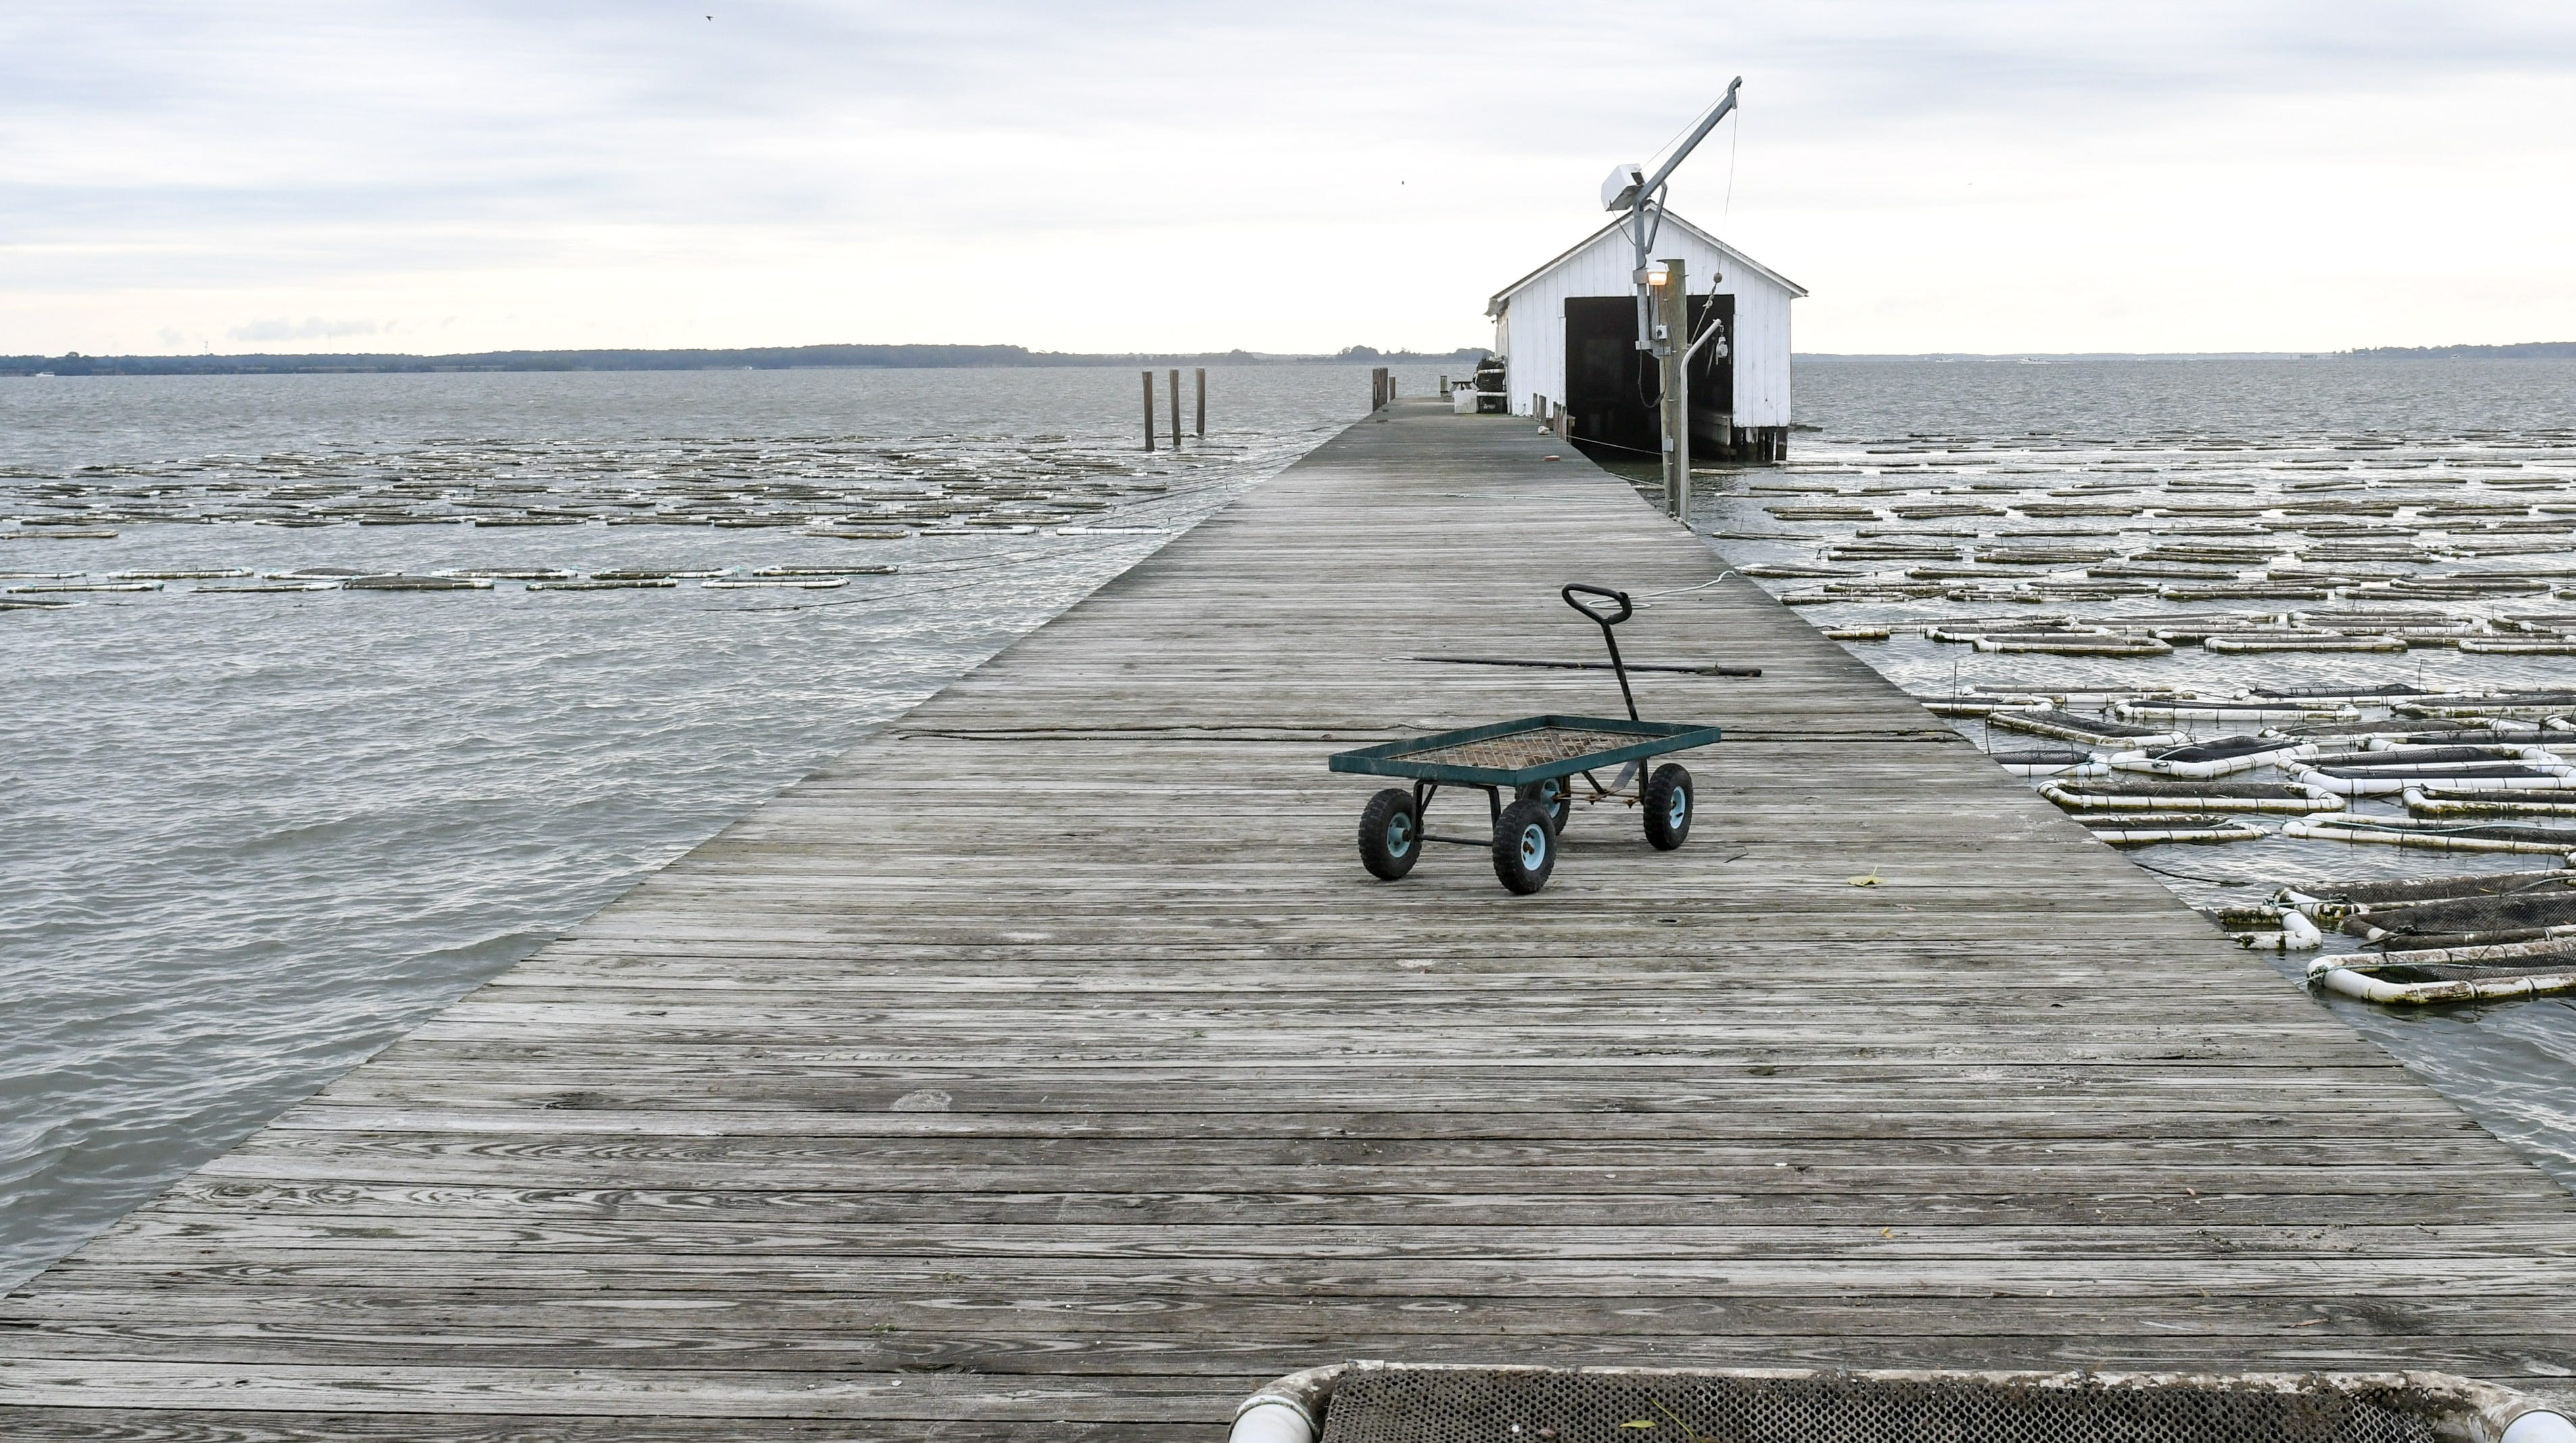 Oysters: Summer rain puts damper on harvest